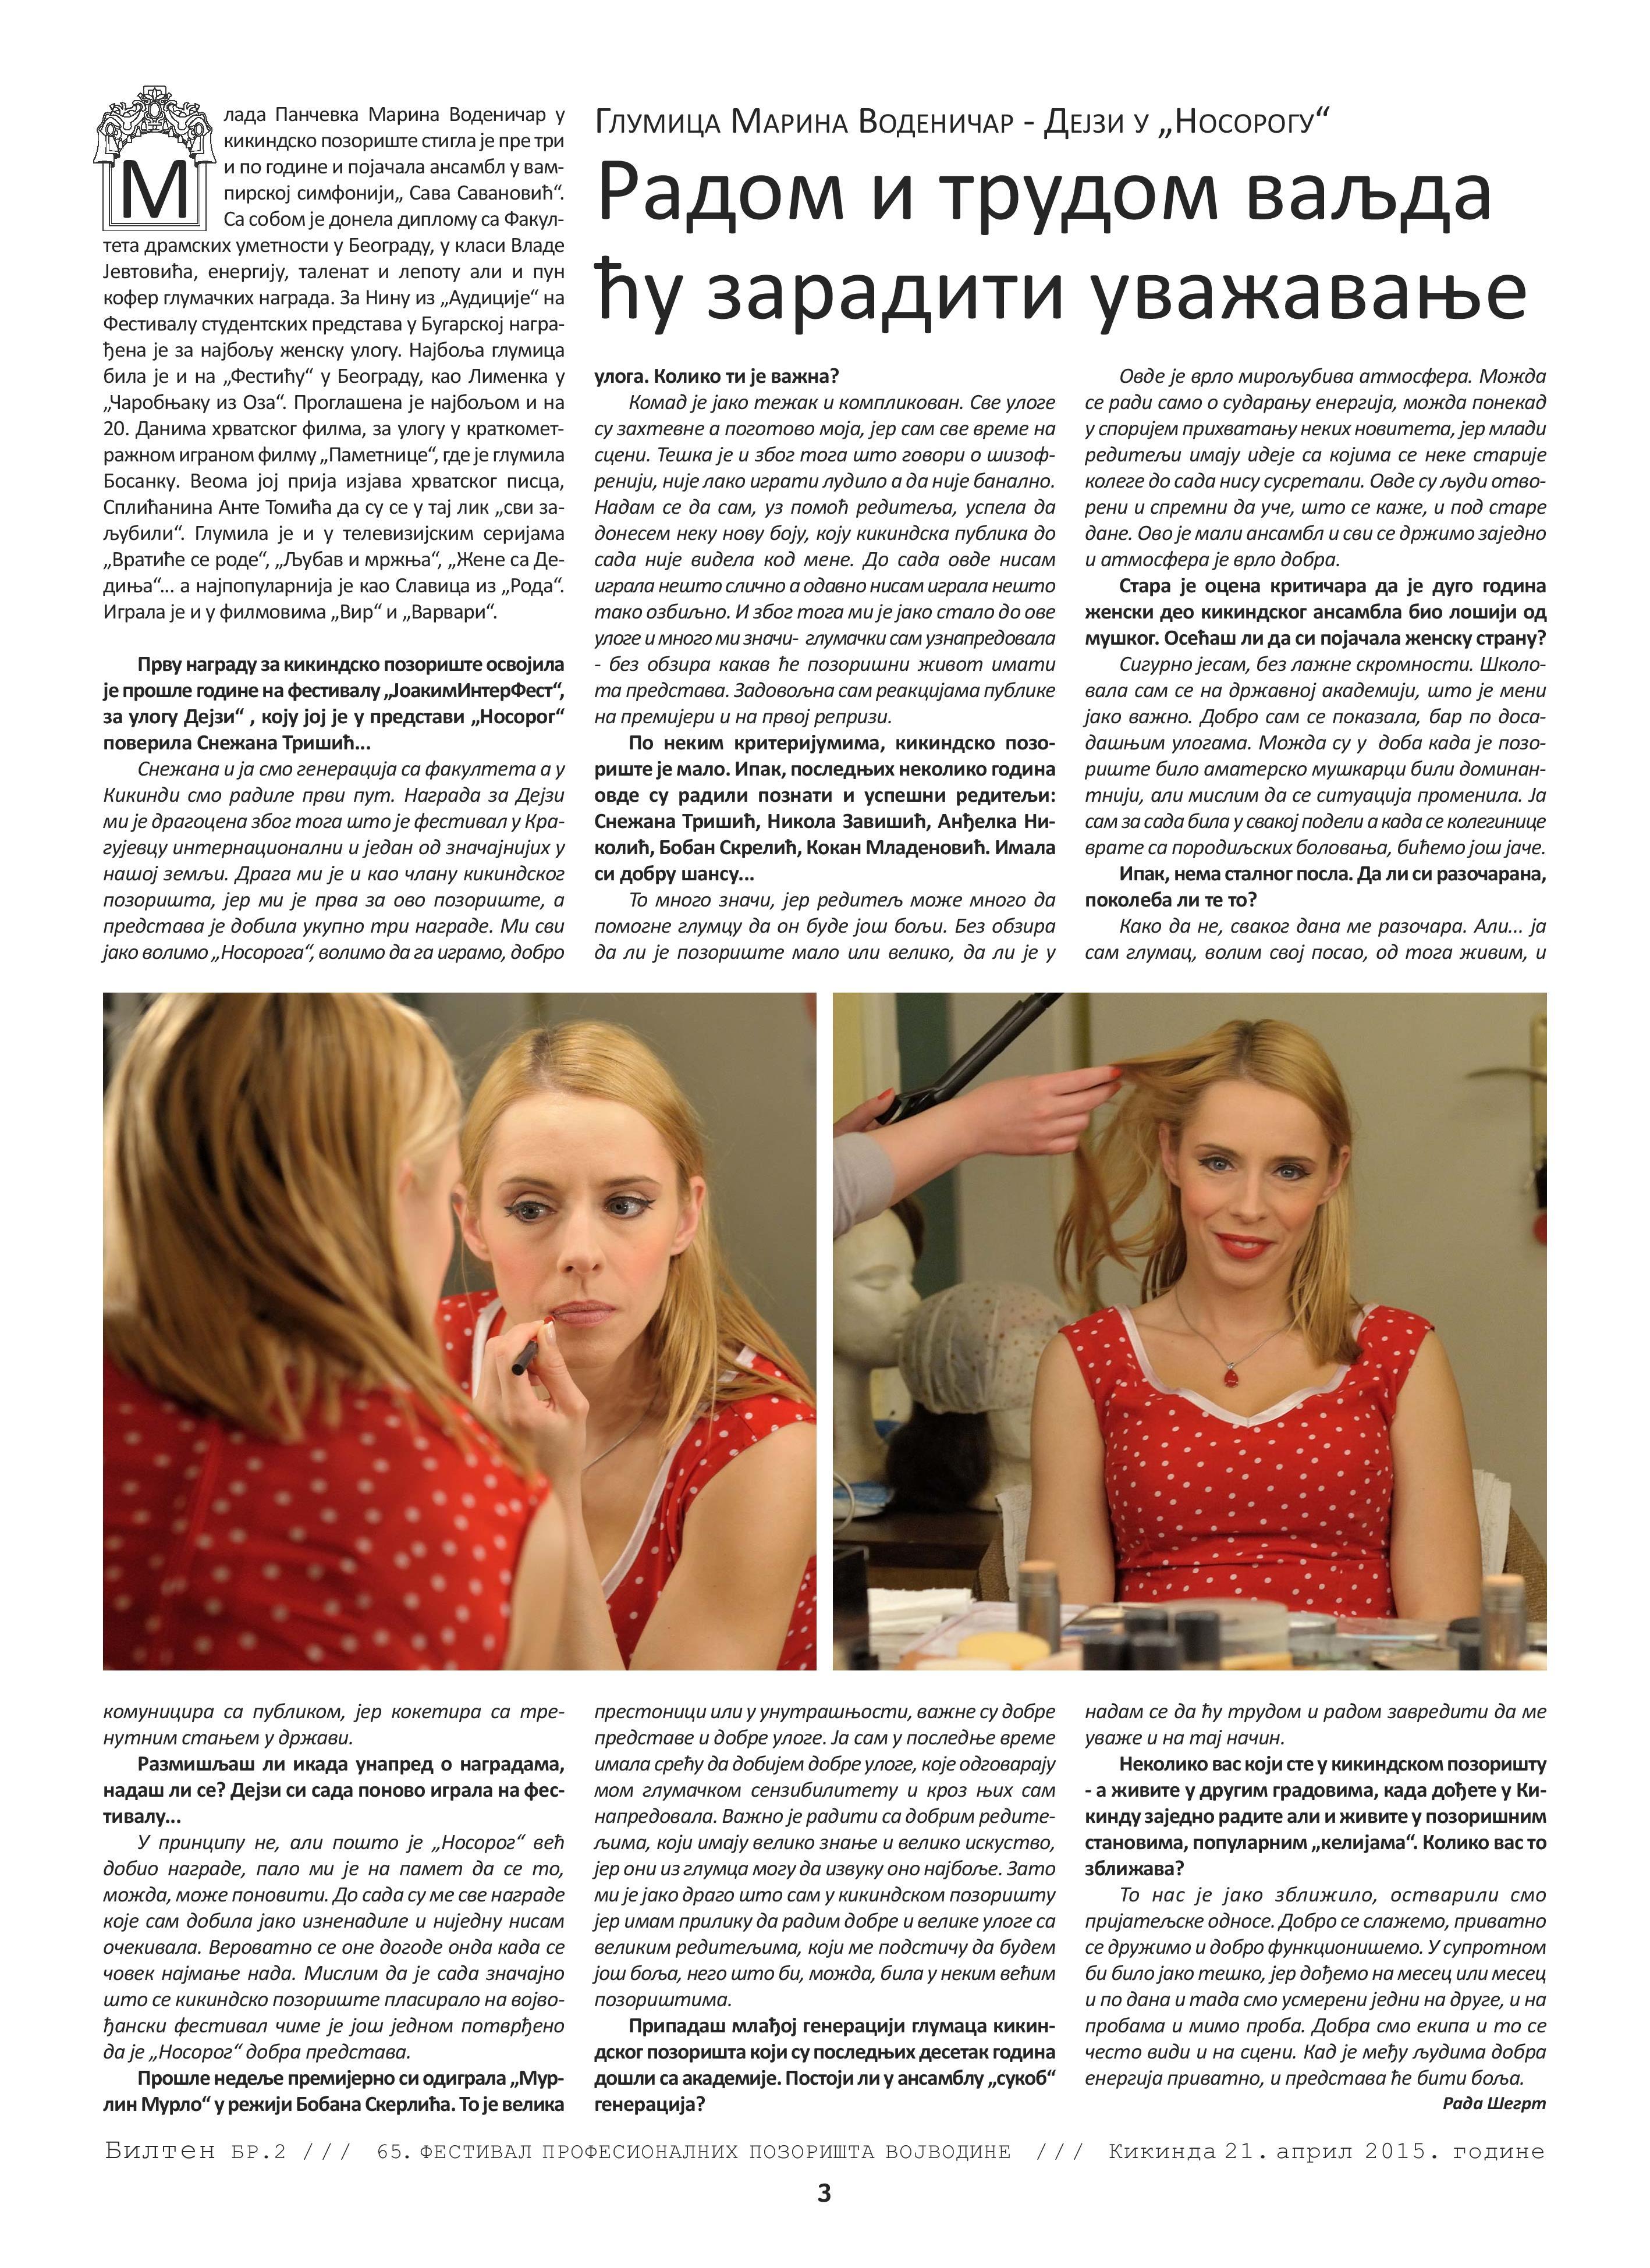 BILTEN_02_21 april-page-003